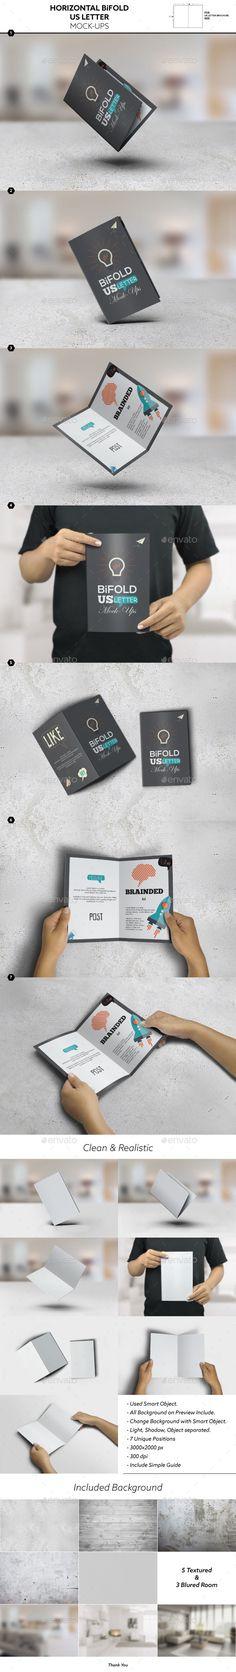 Horizontal Bifold Brochure US Letter Mockups Design Template PSD. Download here: http://graphicriver.net/item/horizontal-bifold-brochure-us-letter-mockups/16887084?ref=yinkira